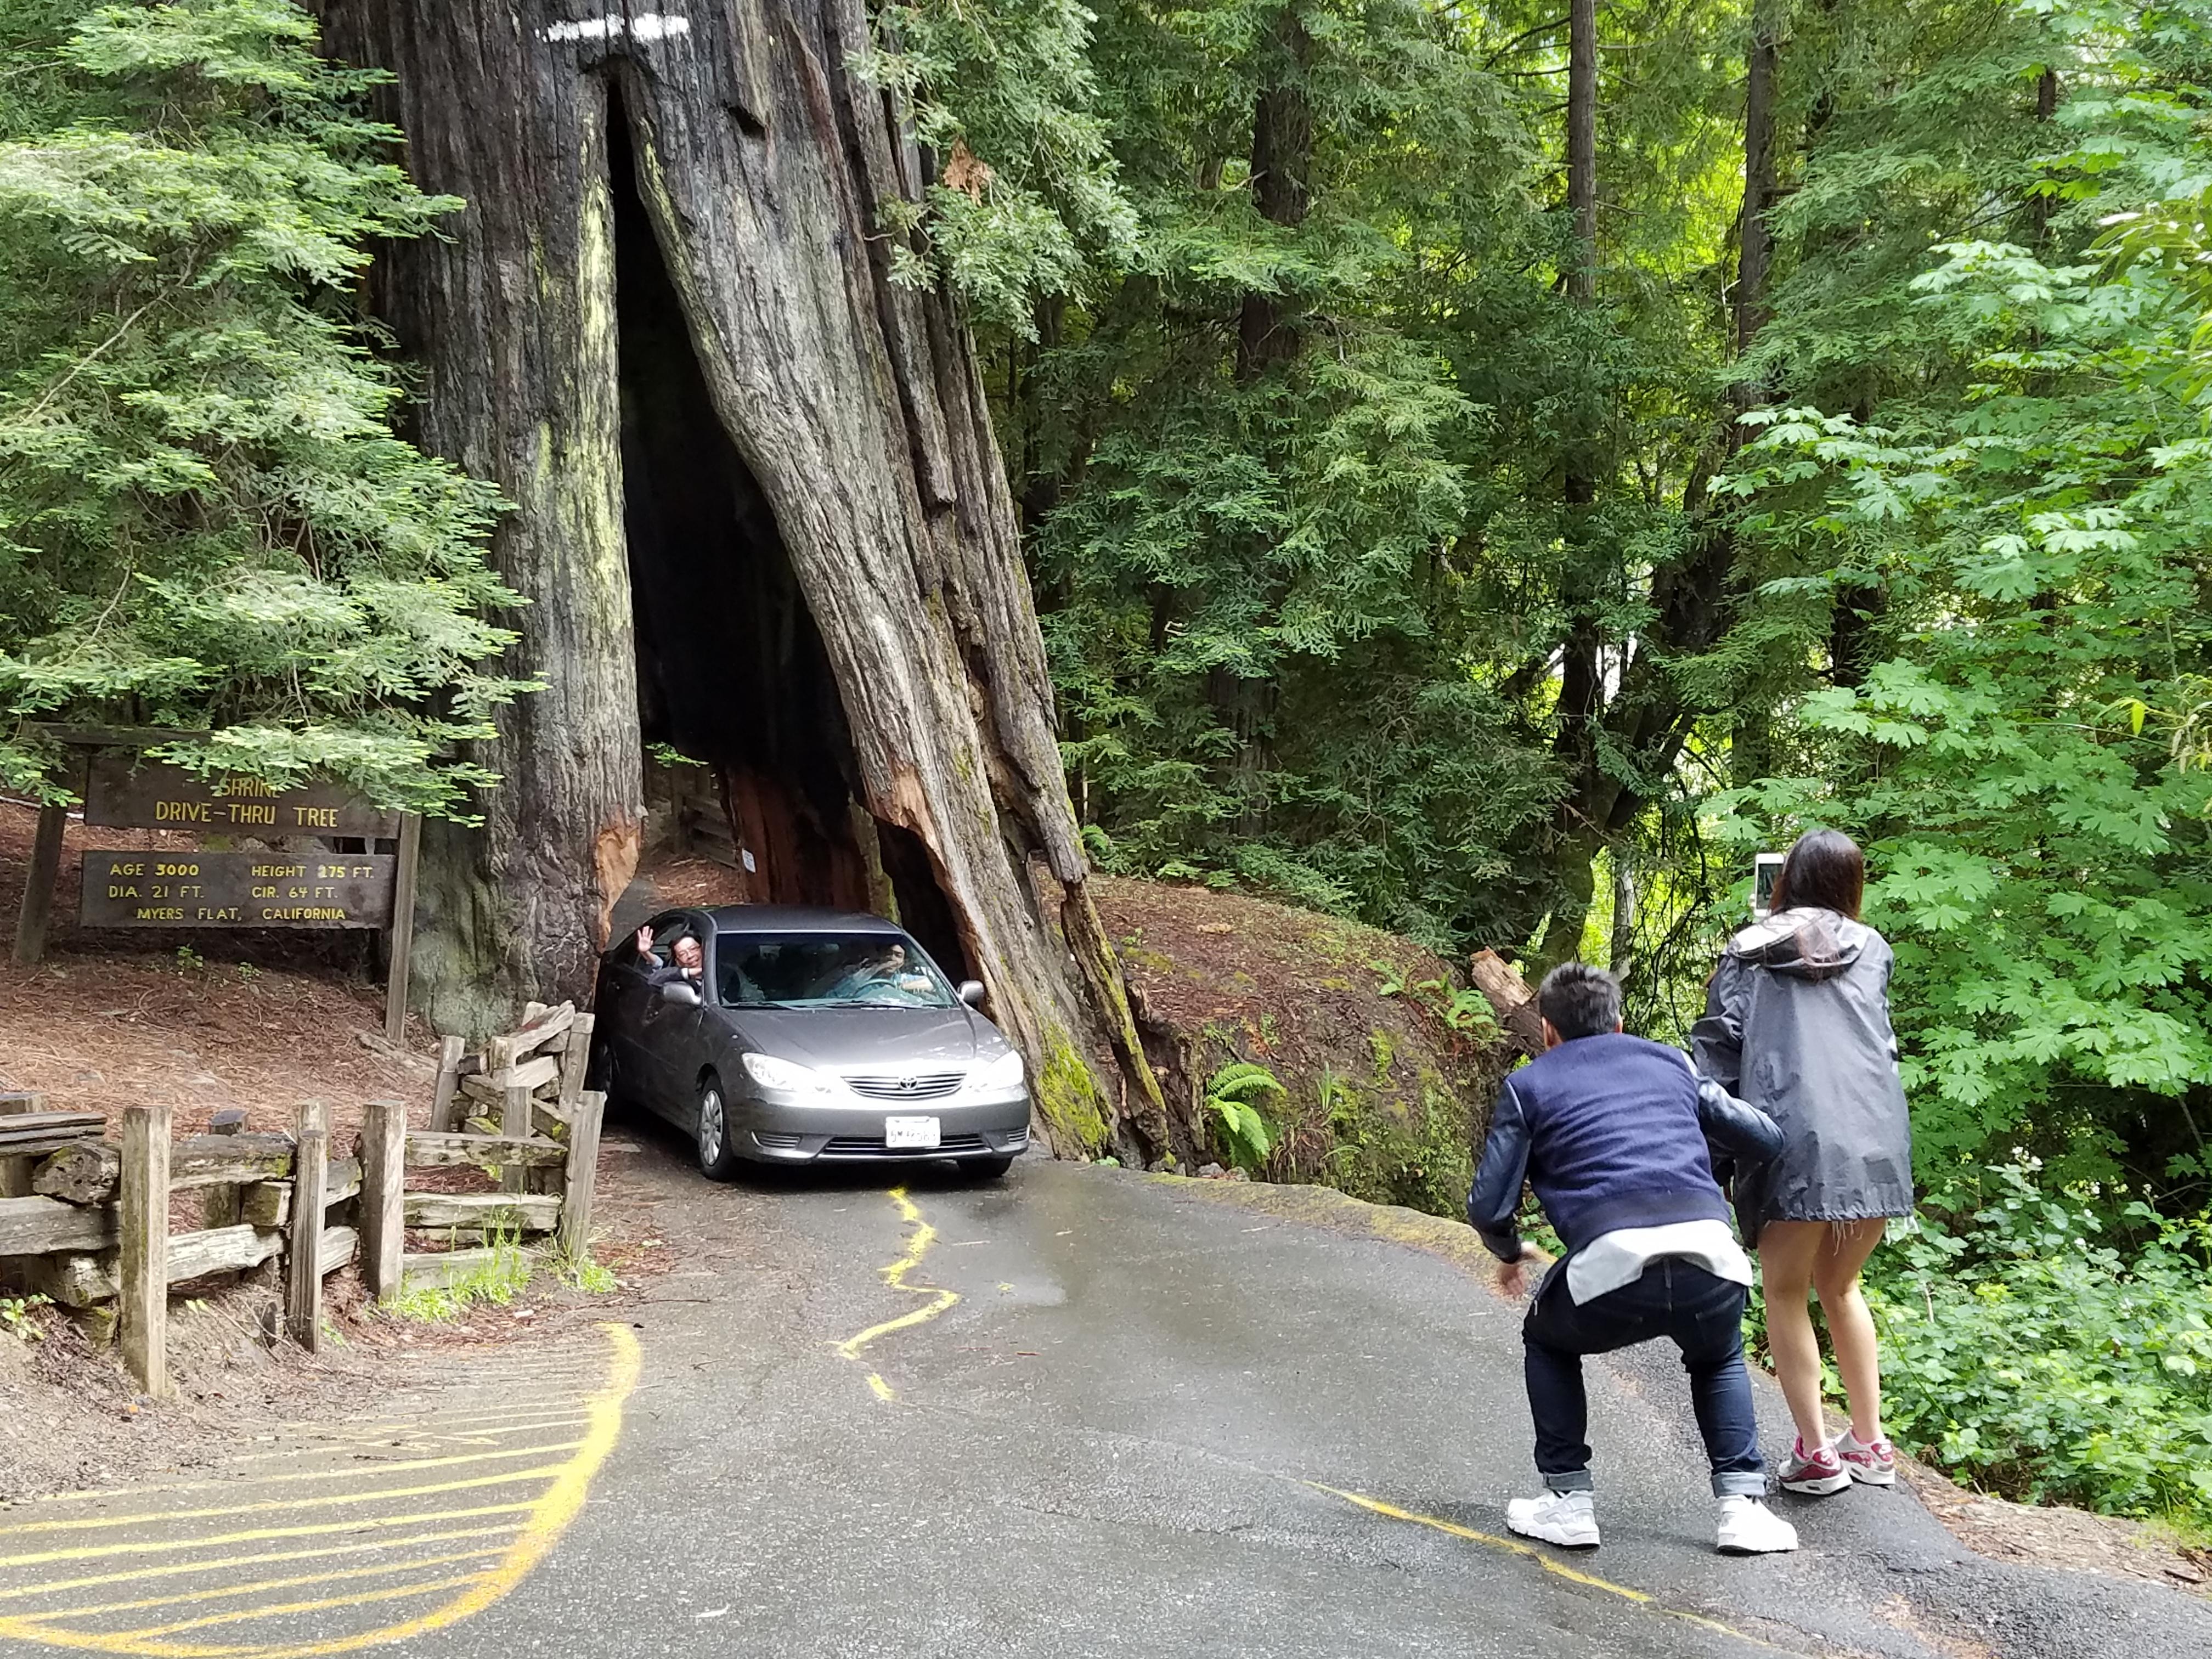 drive through trees